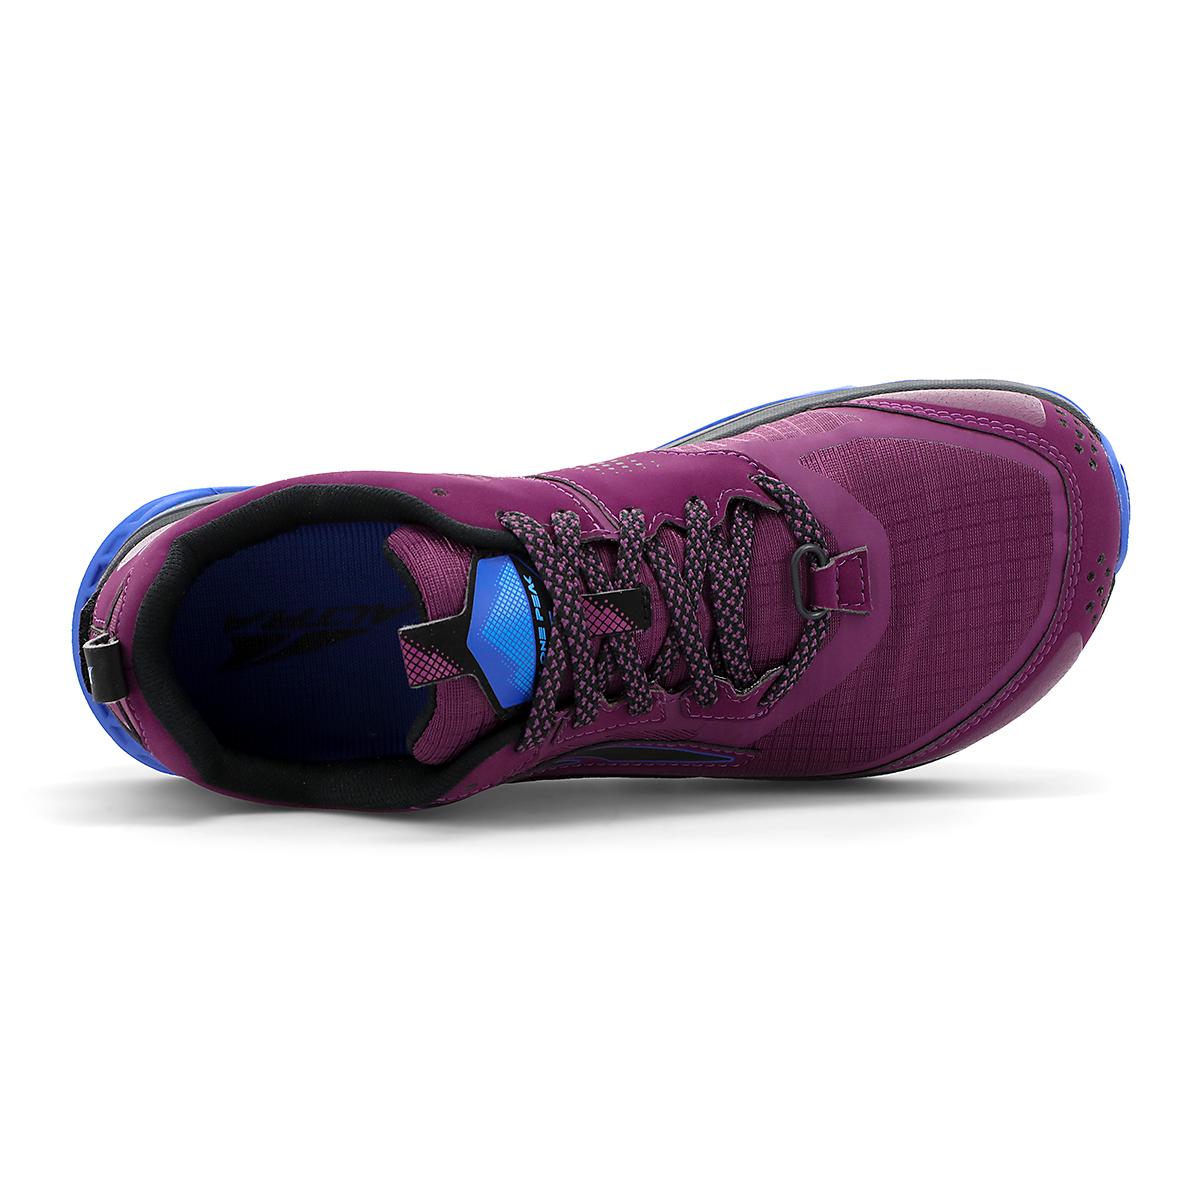 Women's Altra Lone Peak 5 Trail Running Shoe - Color: Plum - Size: 5.5 - Width: Regular, Plum, large, image 3